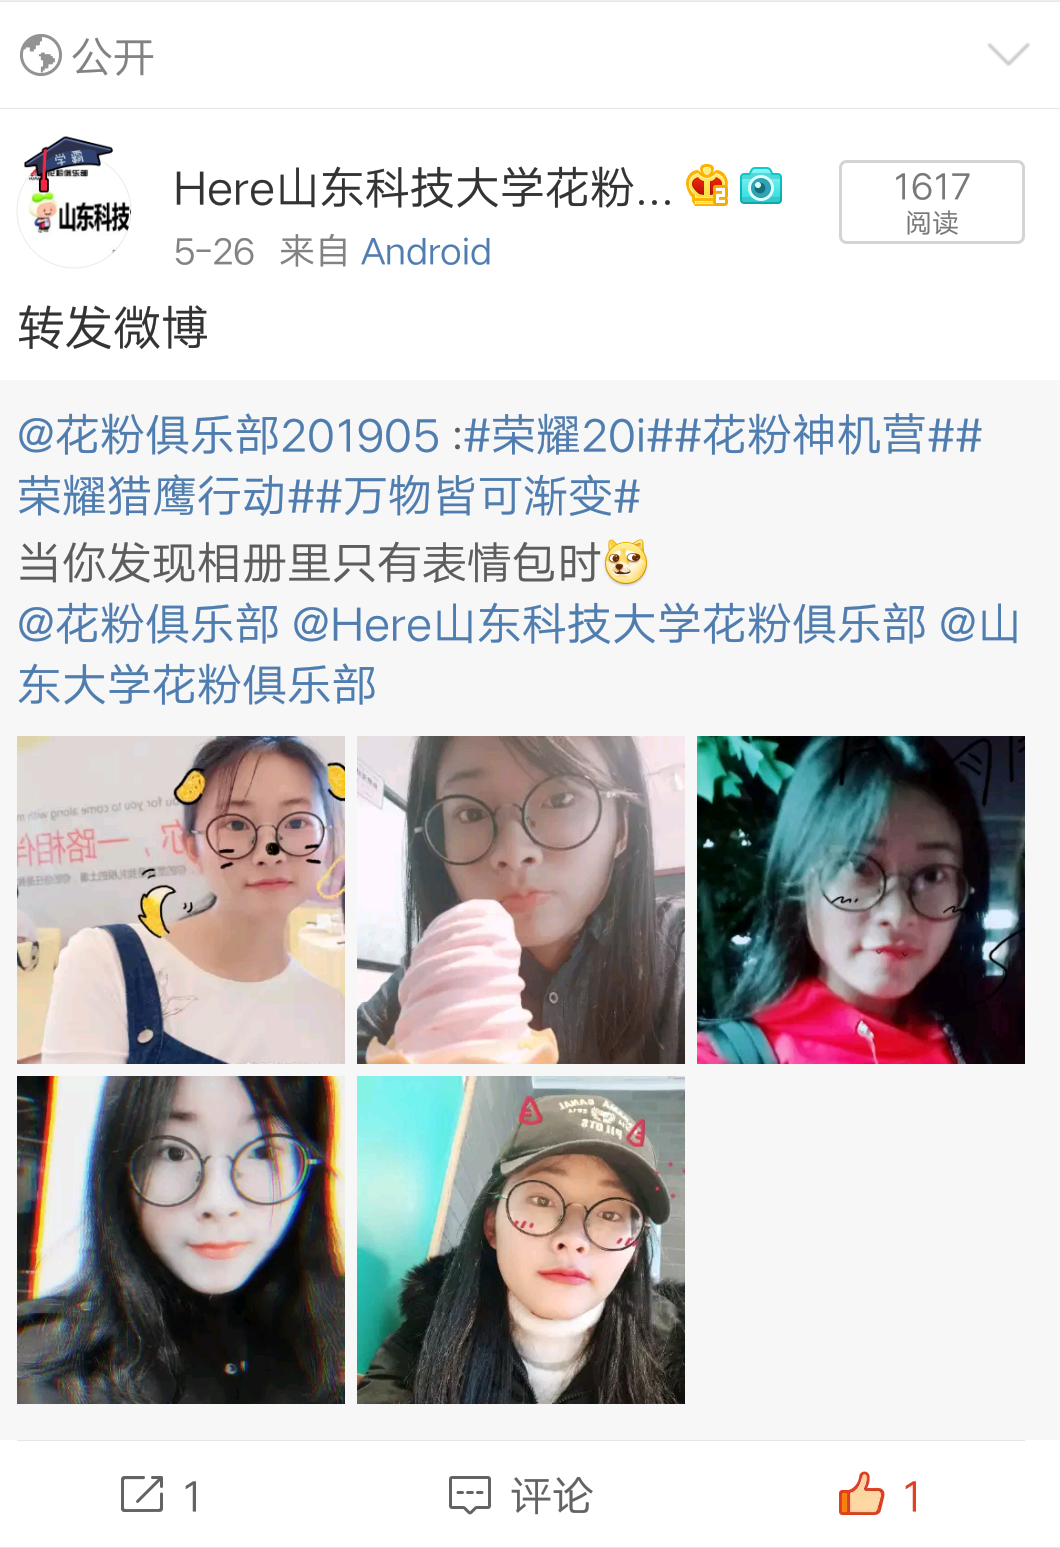 Screenshot_2019_0606_110210.png